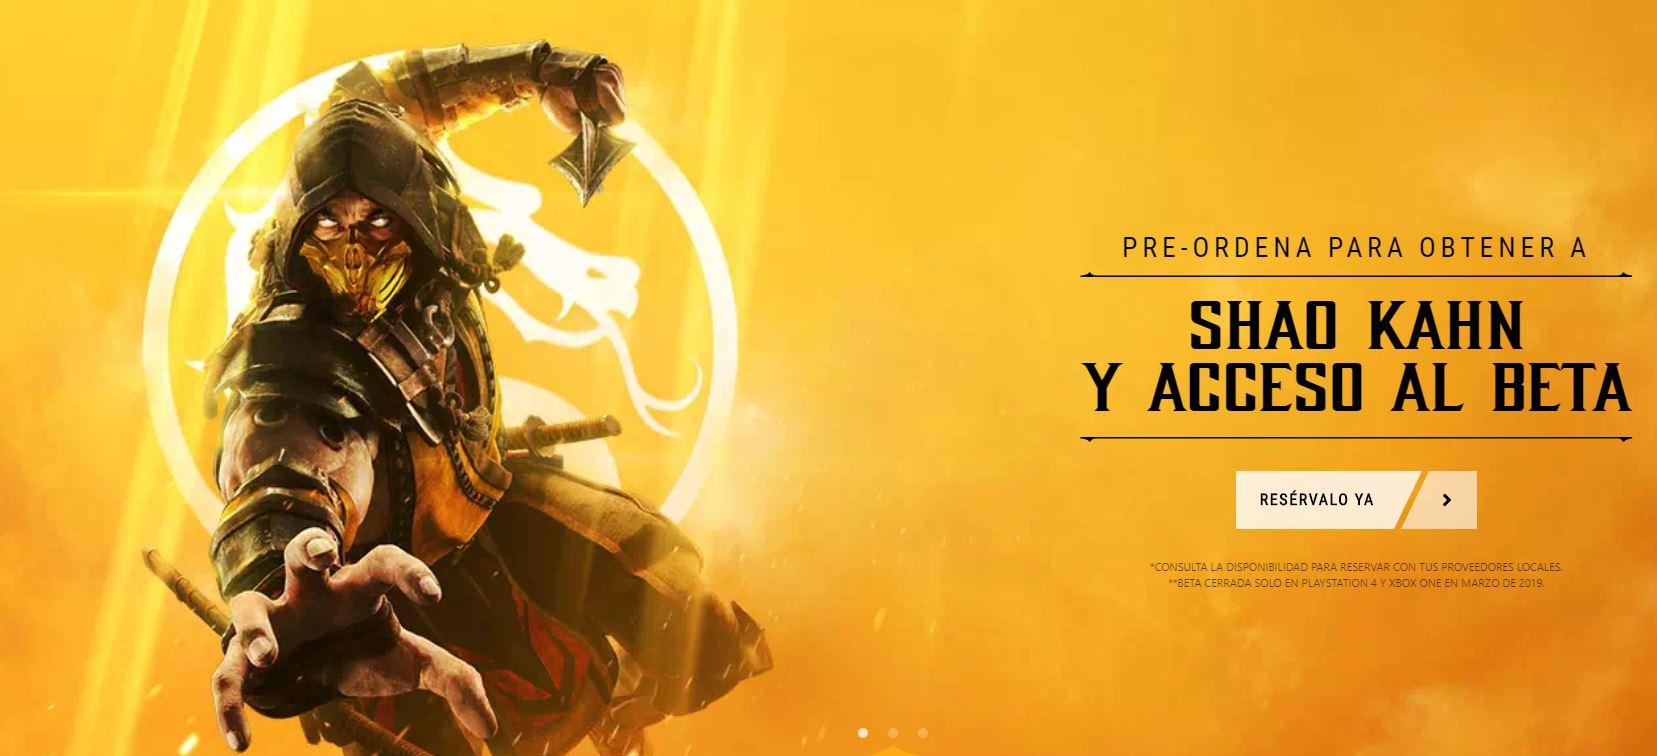 Mortal Kombat 11 Pre-order